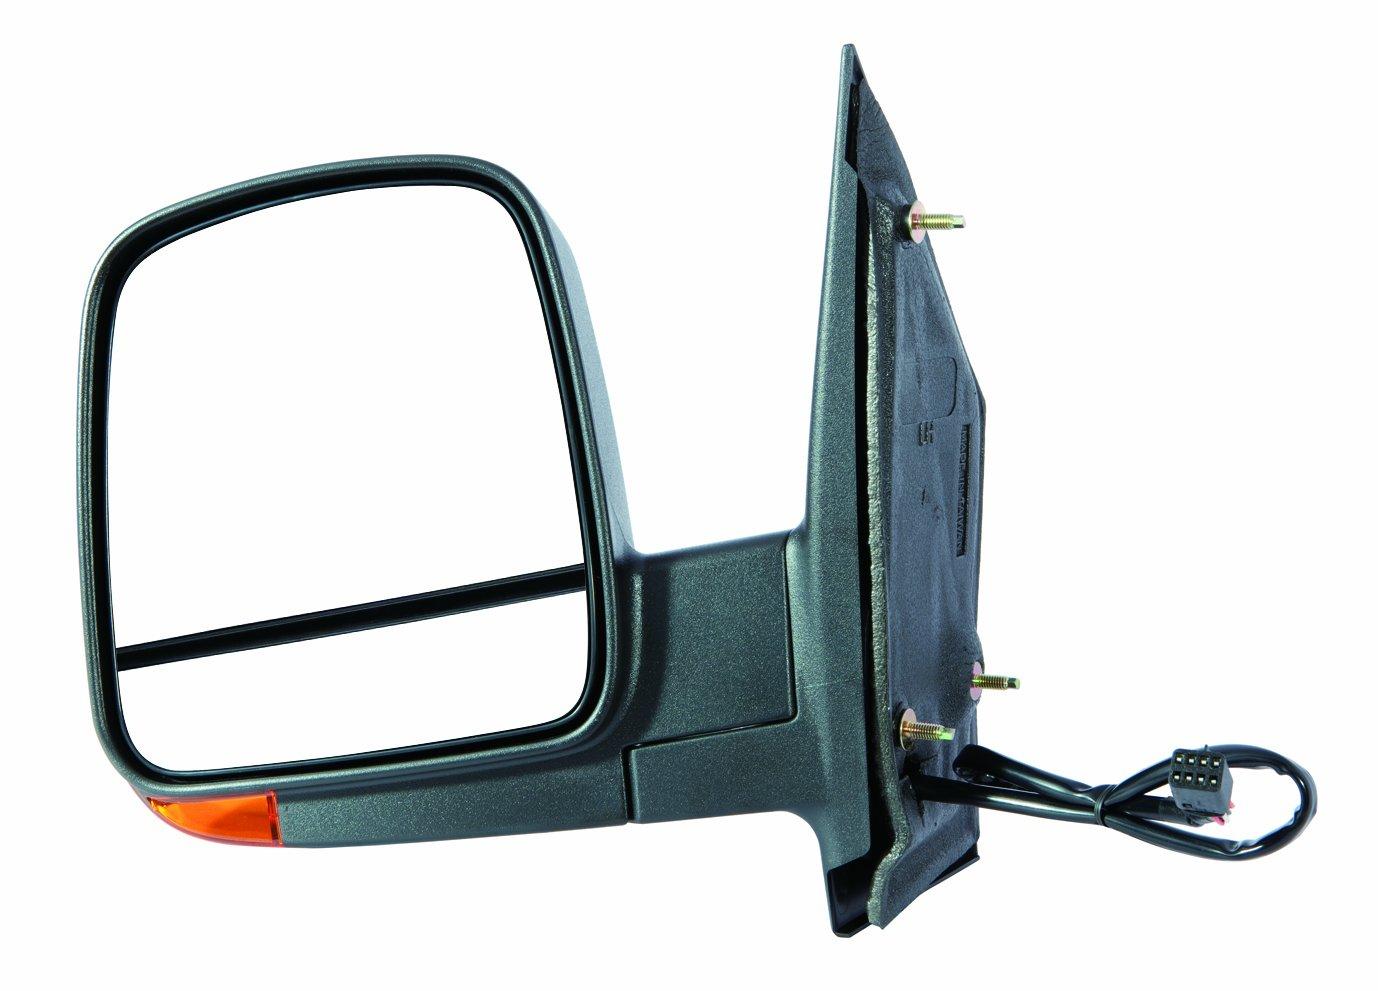 Depo 335-5429R3EFH2 Chevy Express//GMC Savana Passenger Side Textured Heated Power Mirror with Turn Signal